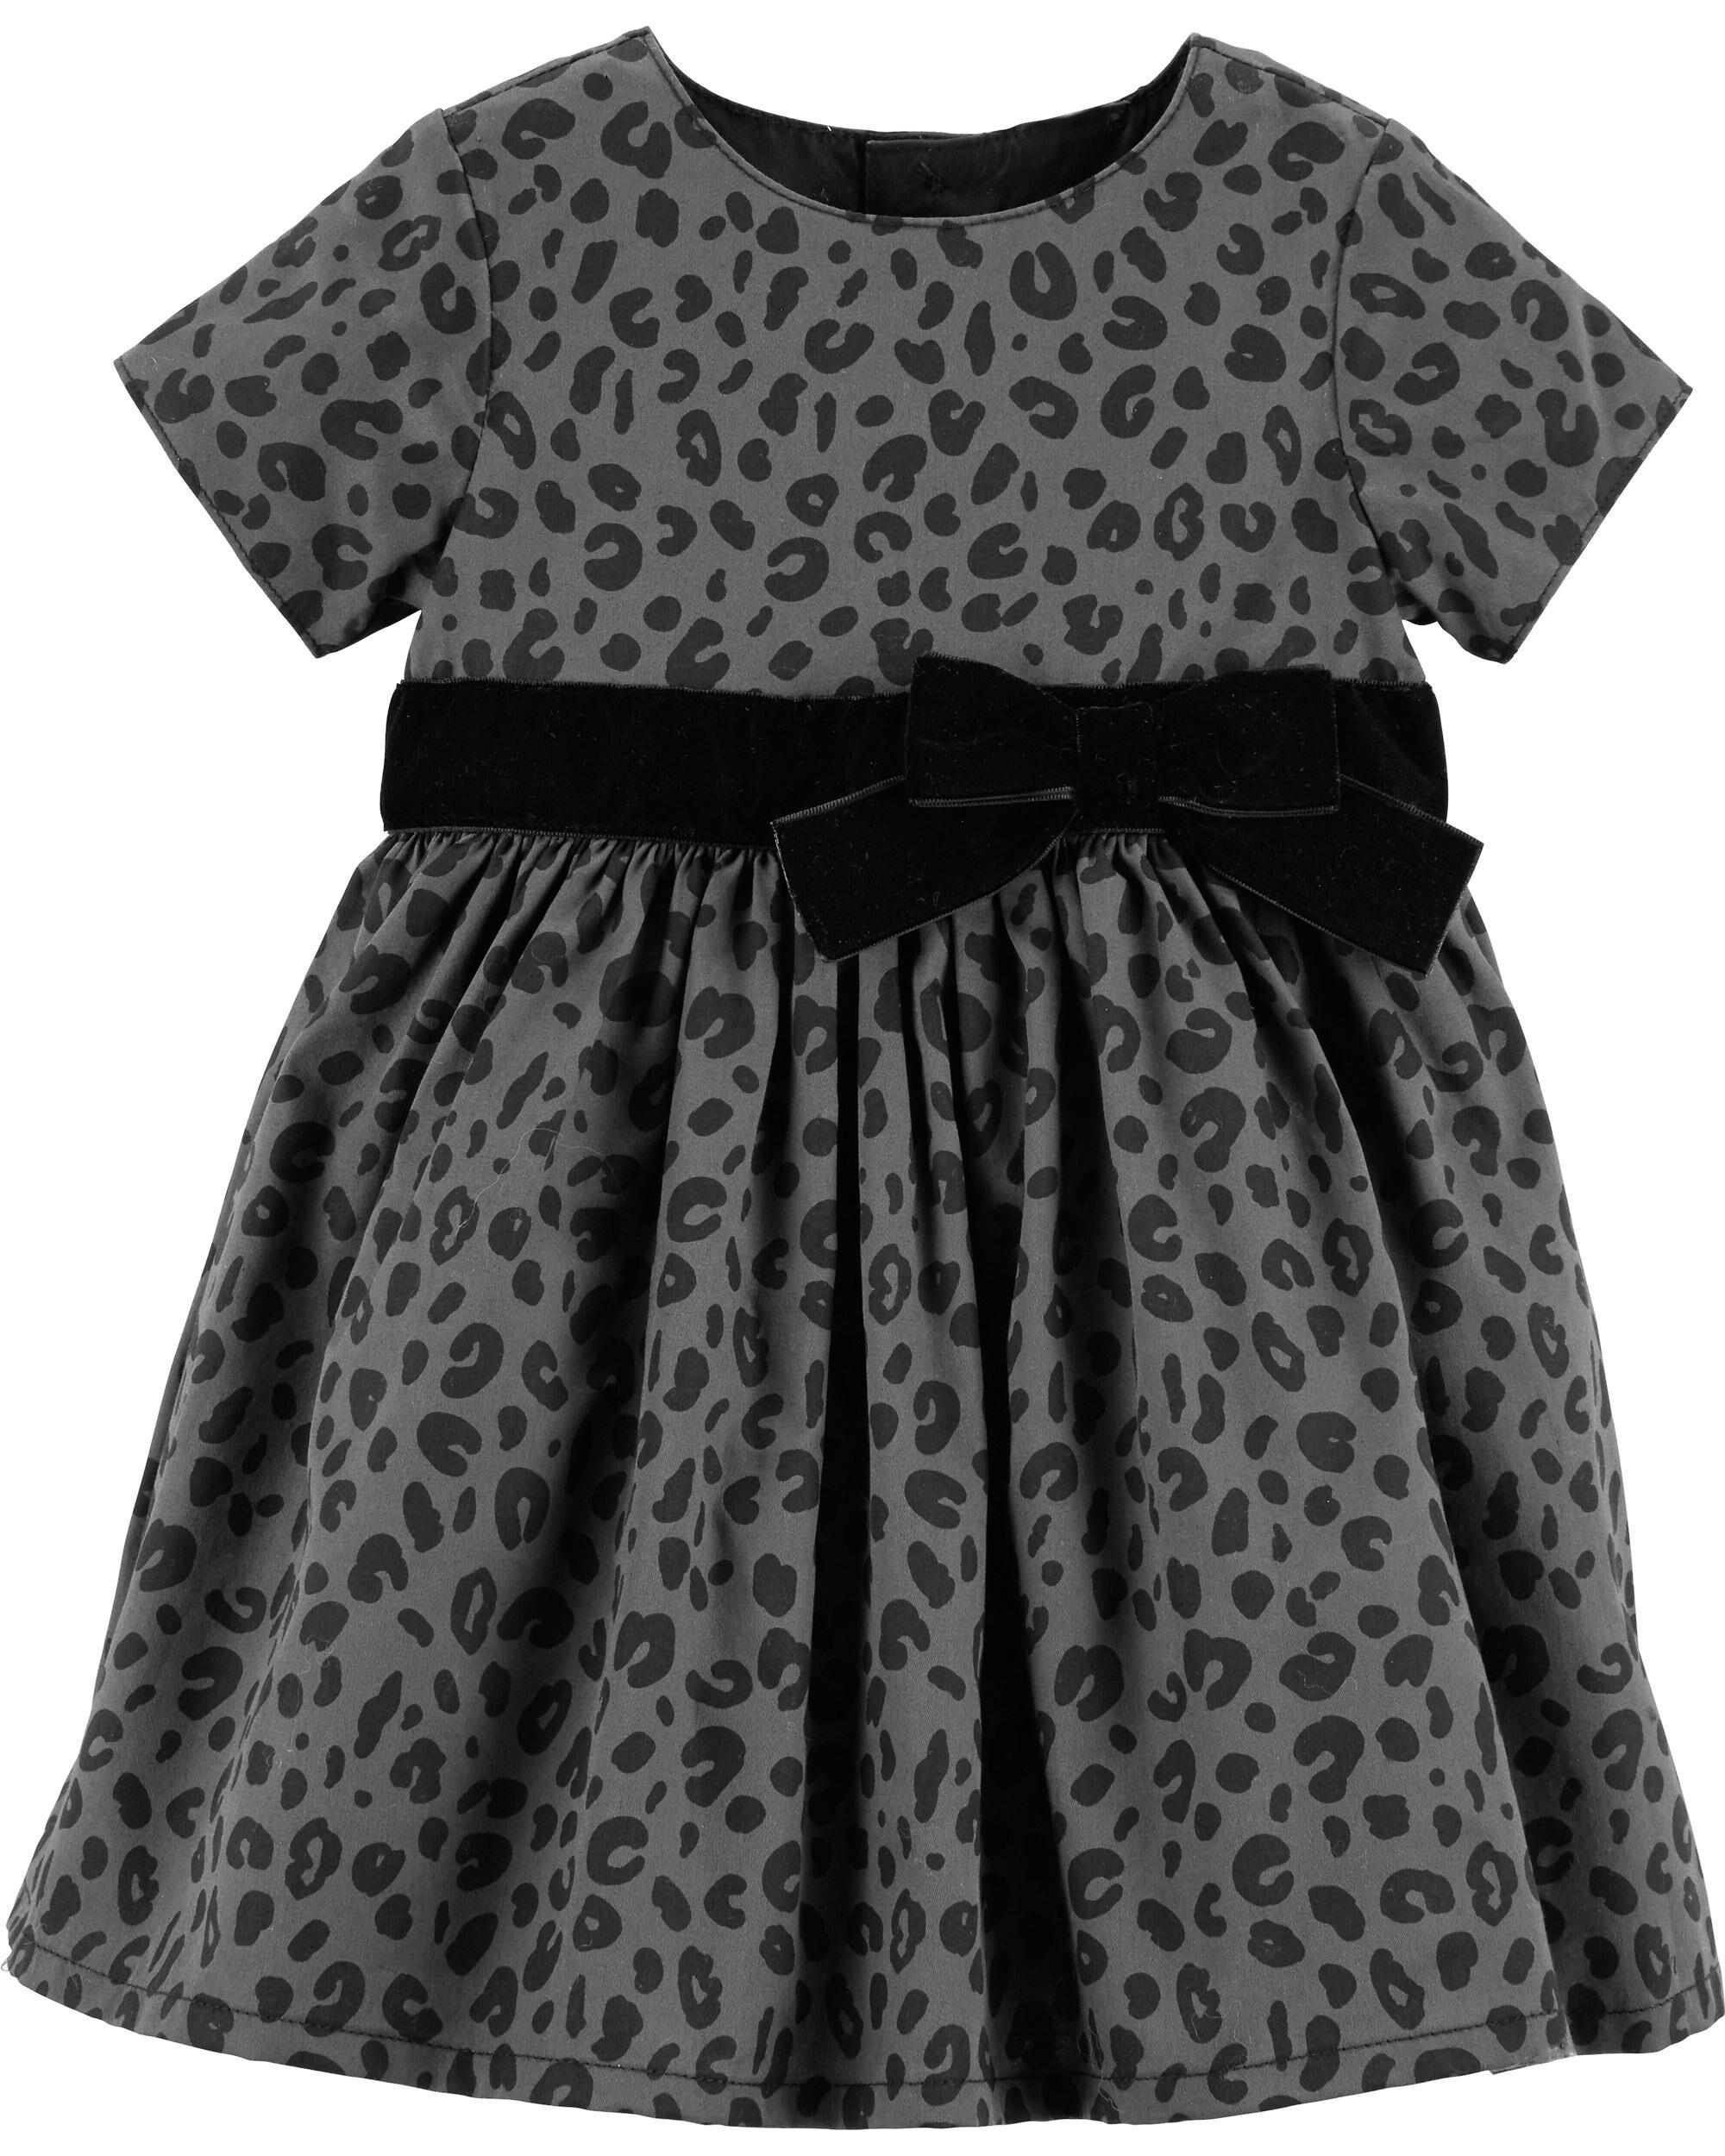 eb4f0e875 Cheetah Print Holiday Dress | Carters.com